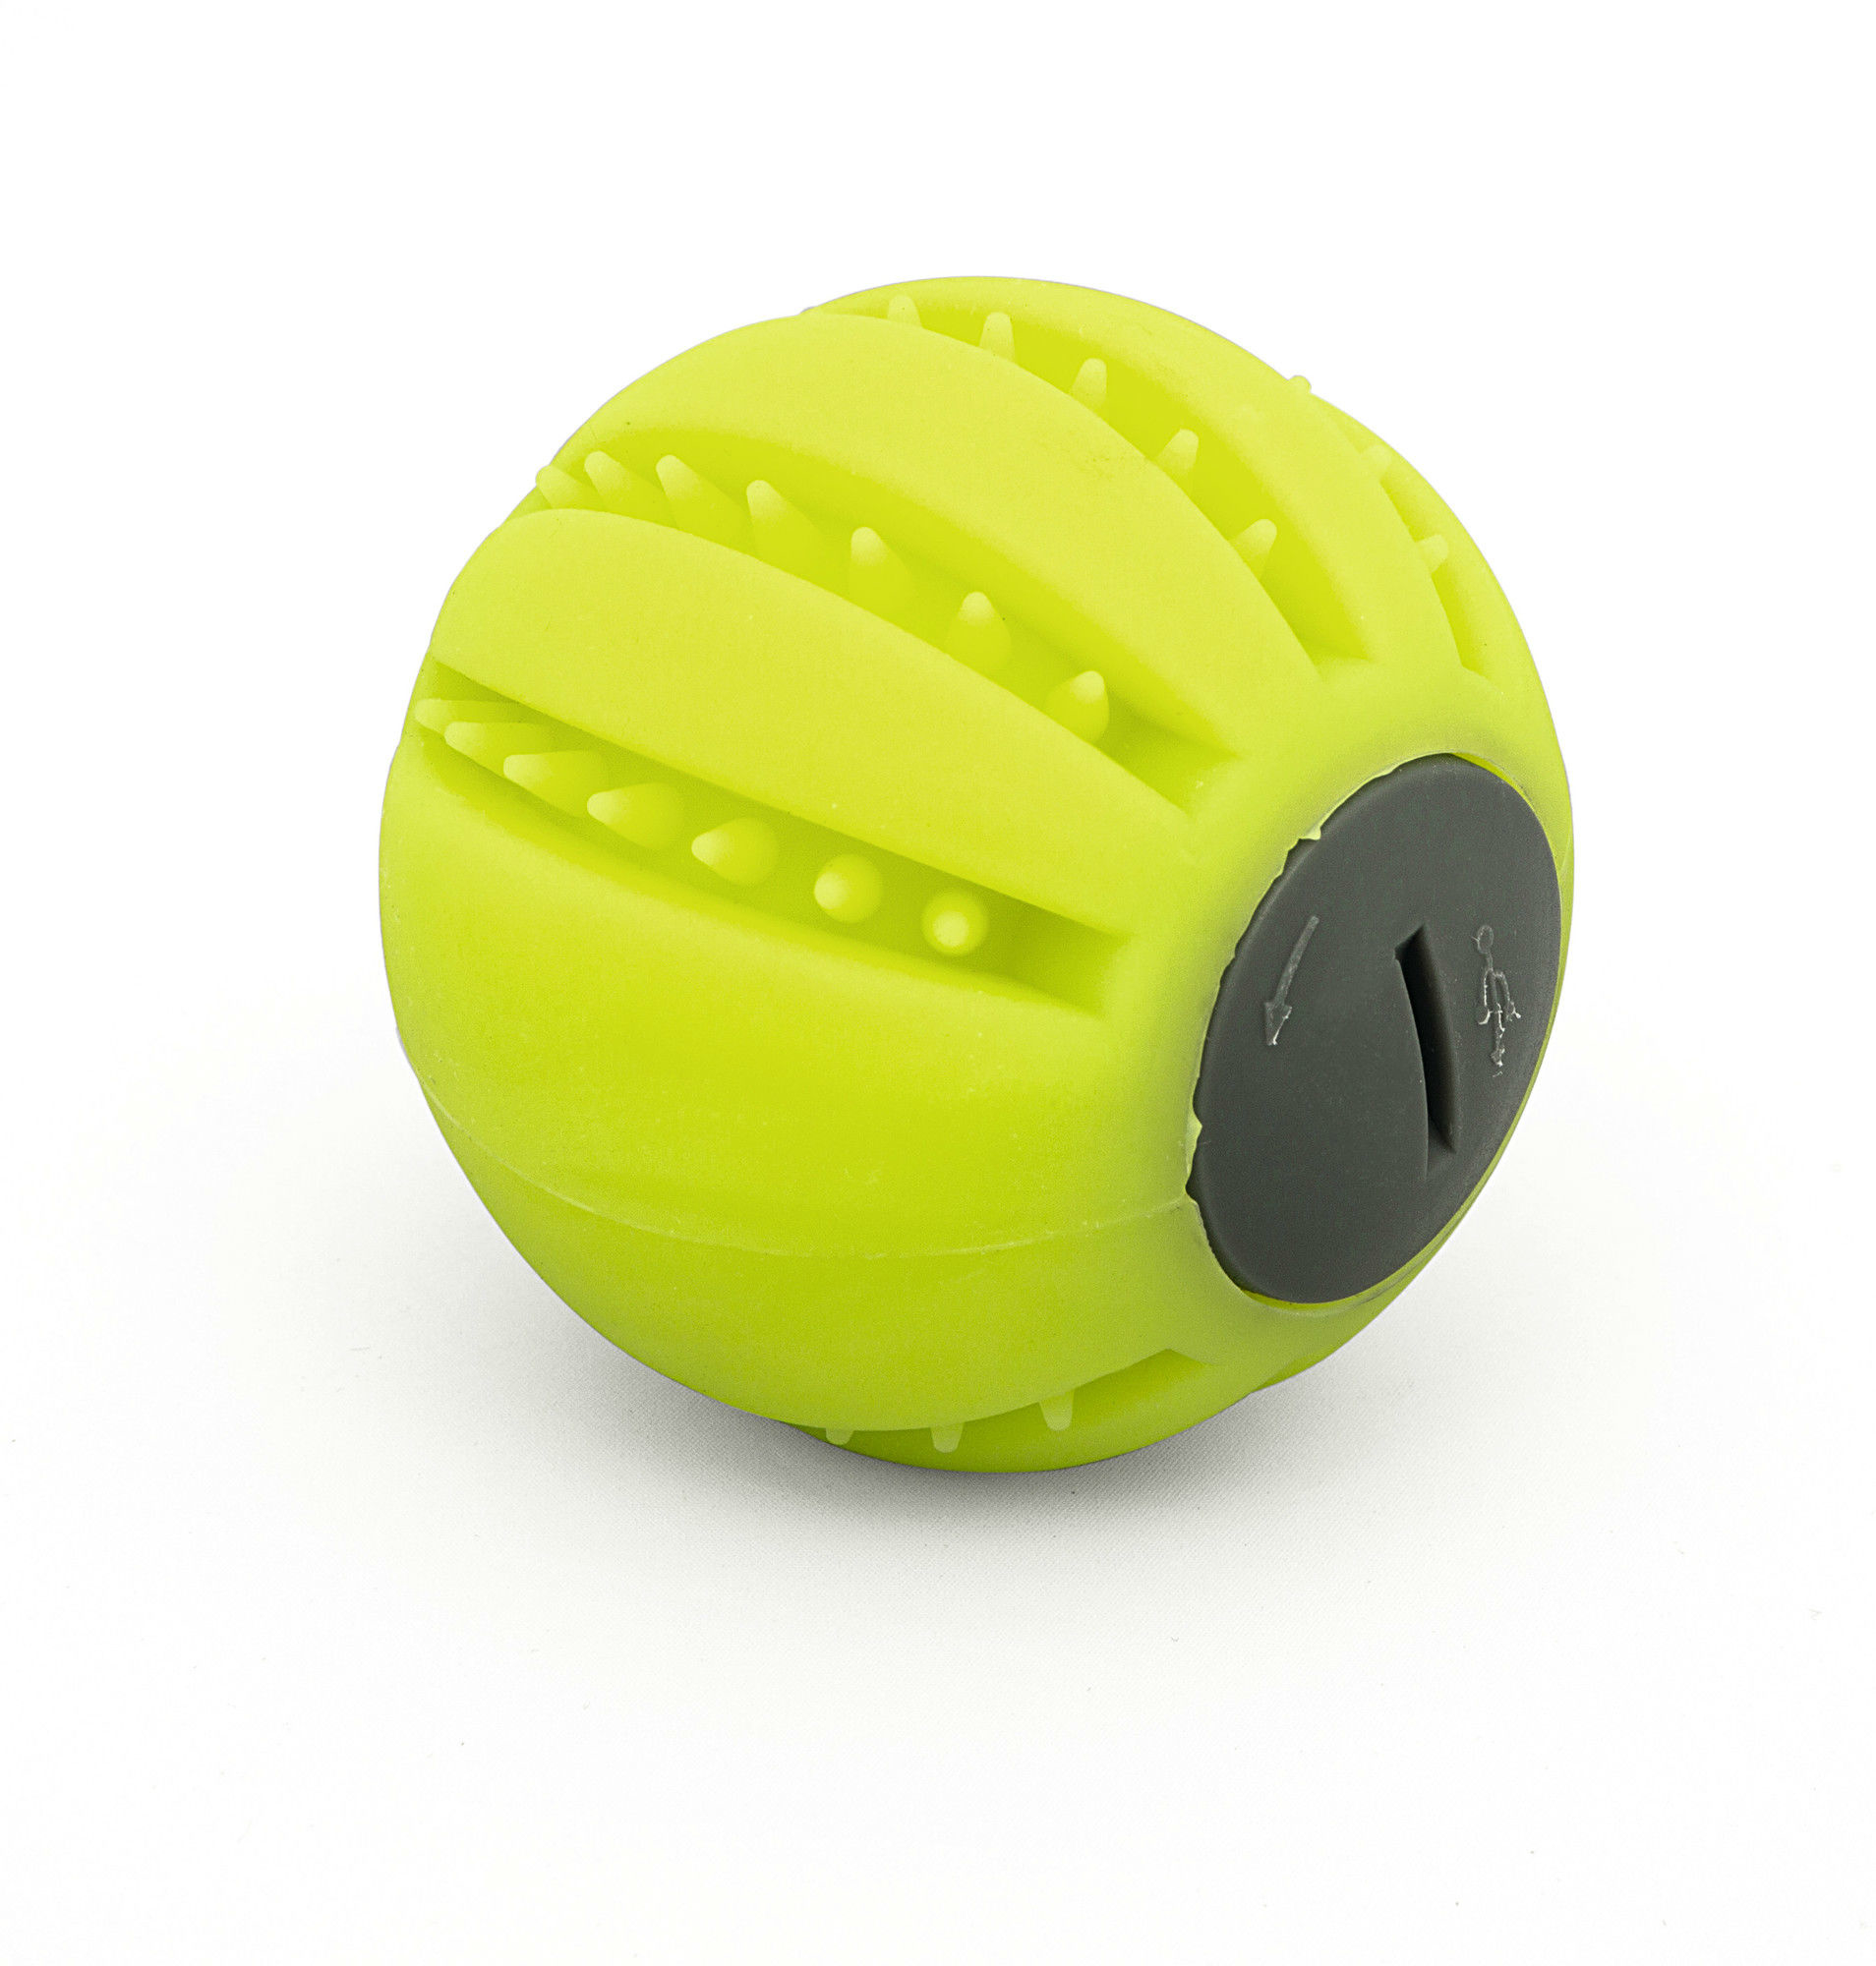 HUNTER-LED-Leuchtball-fuer-Hunde-Yukon